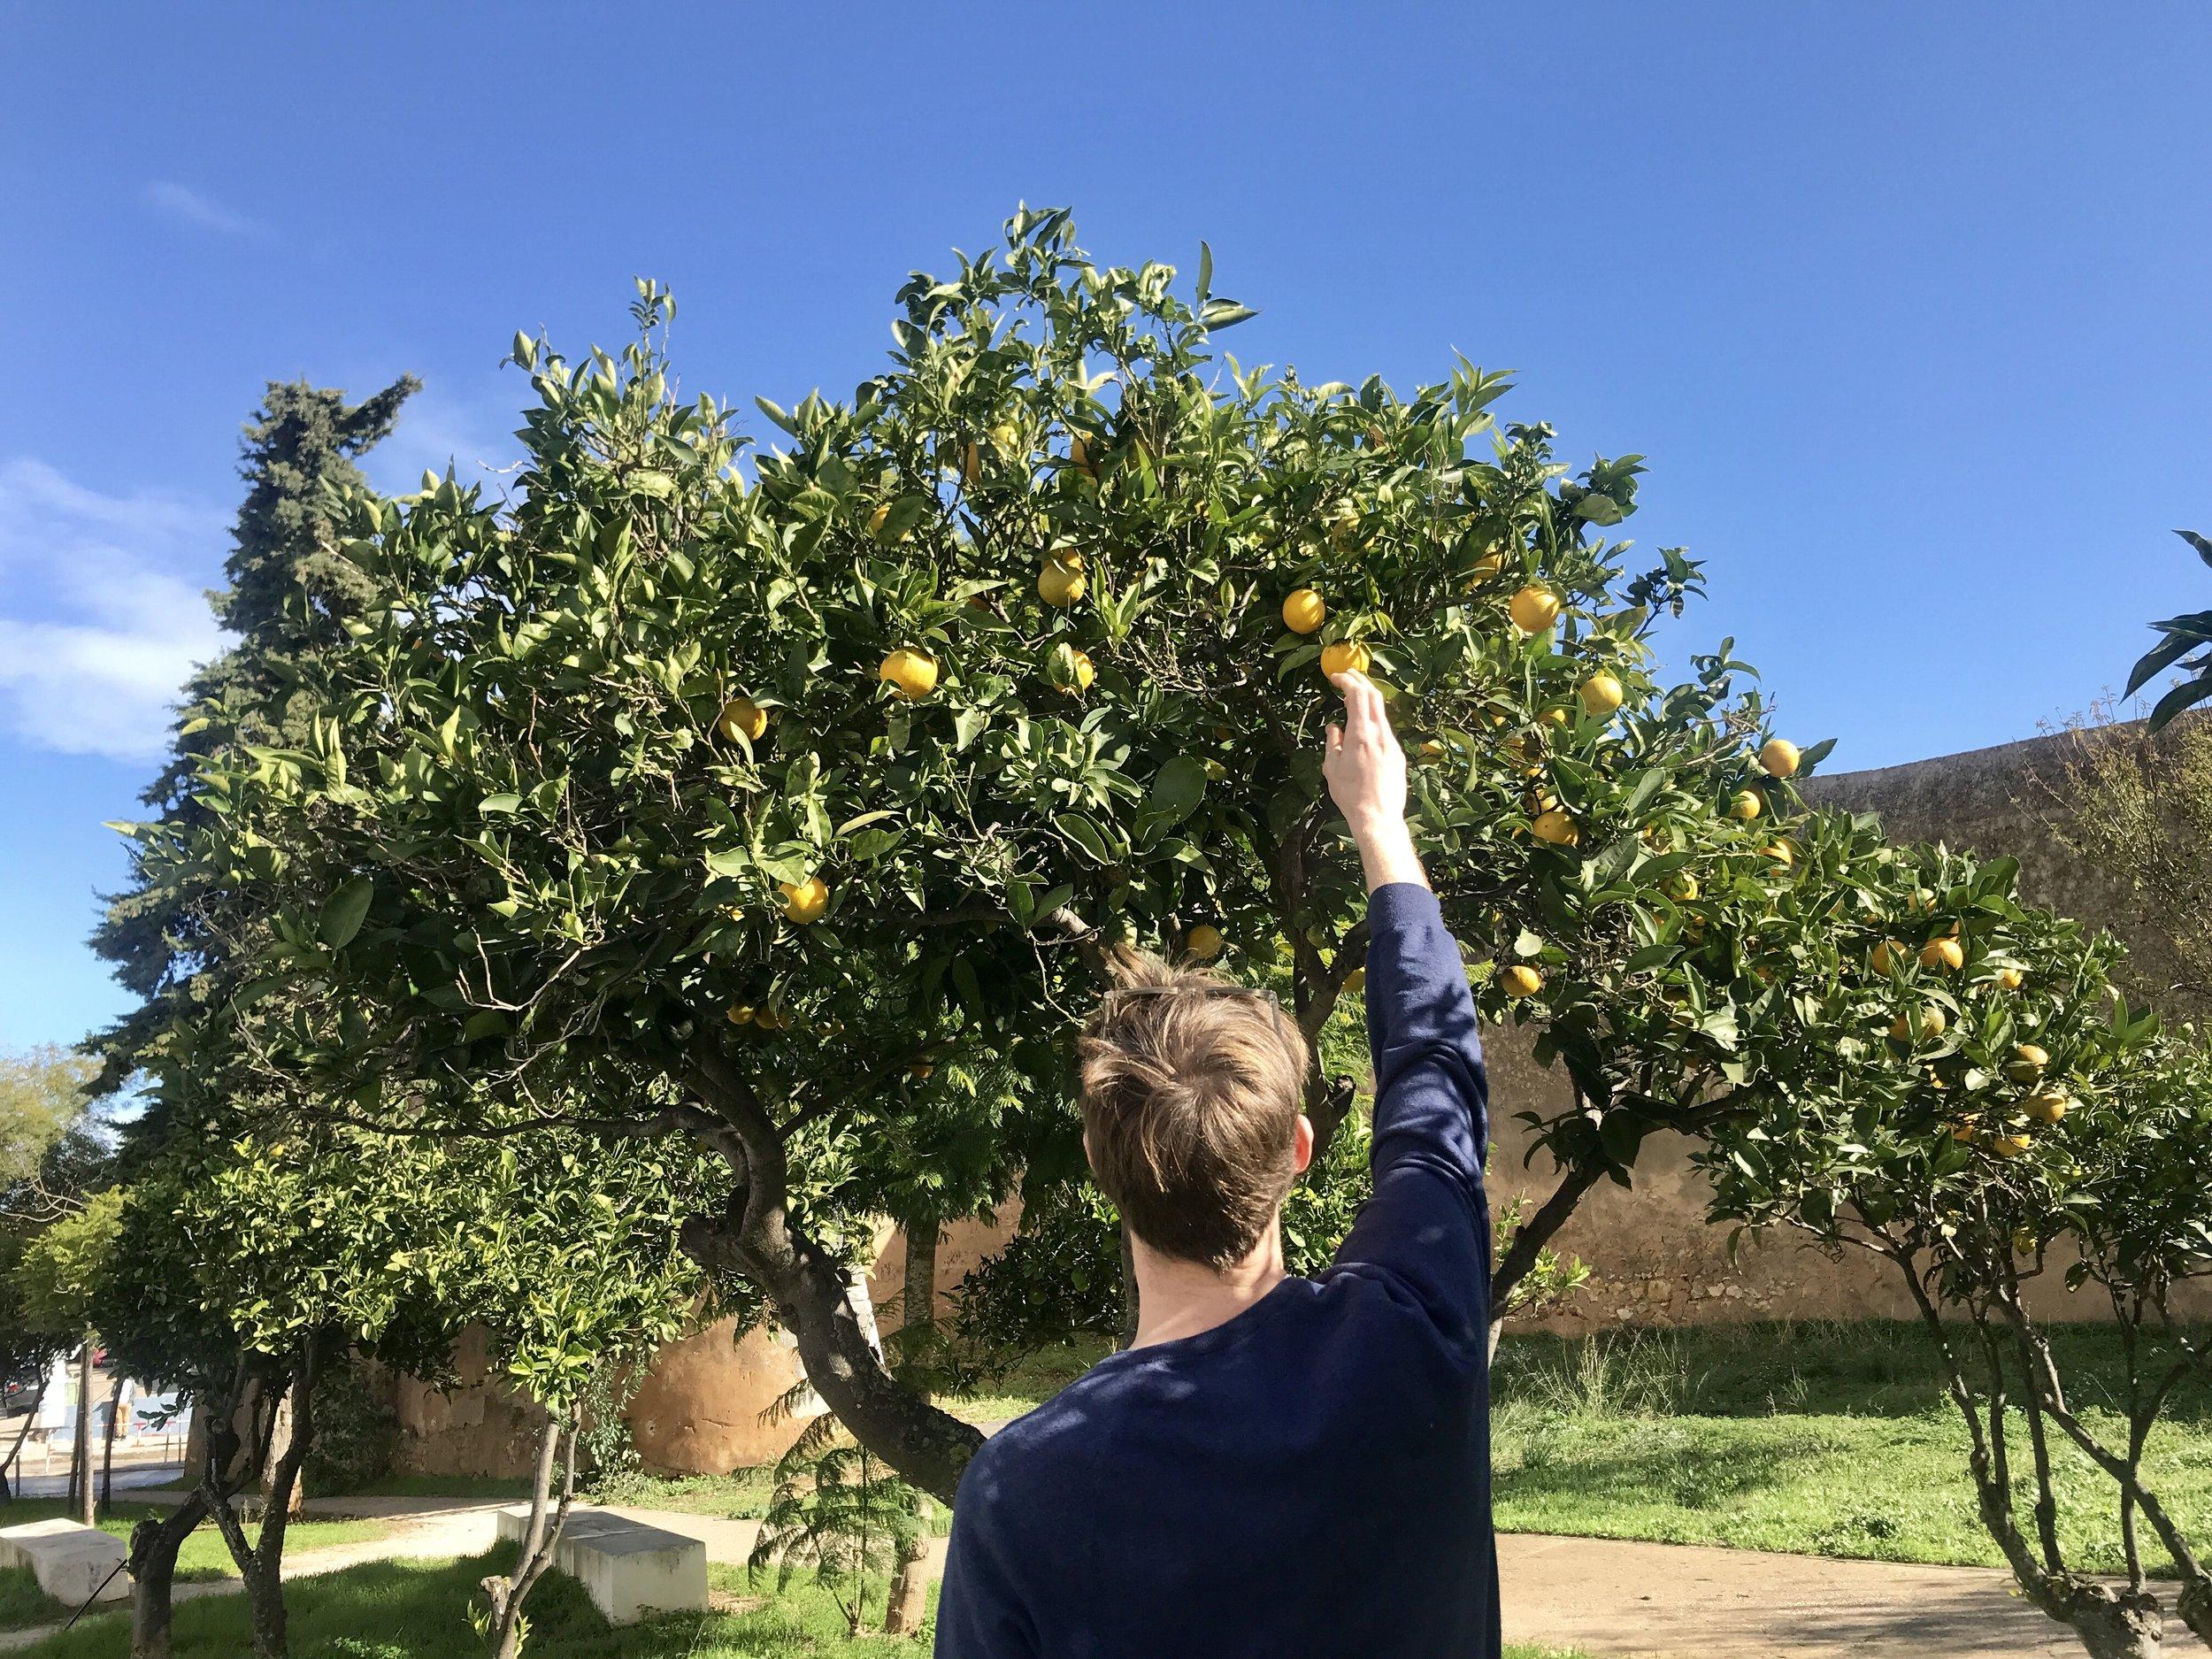 George picking oranges in Lagos